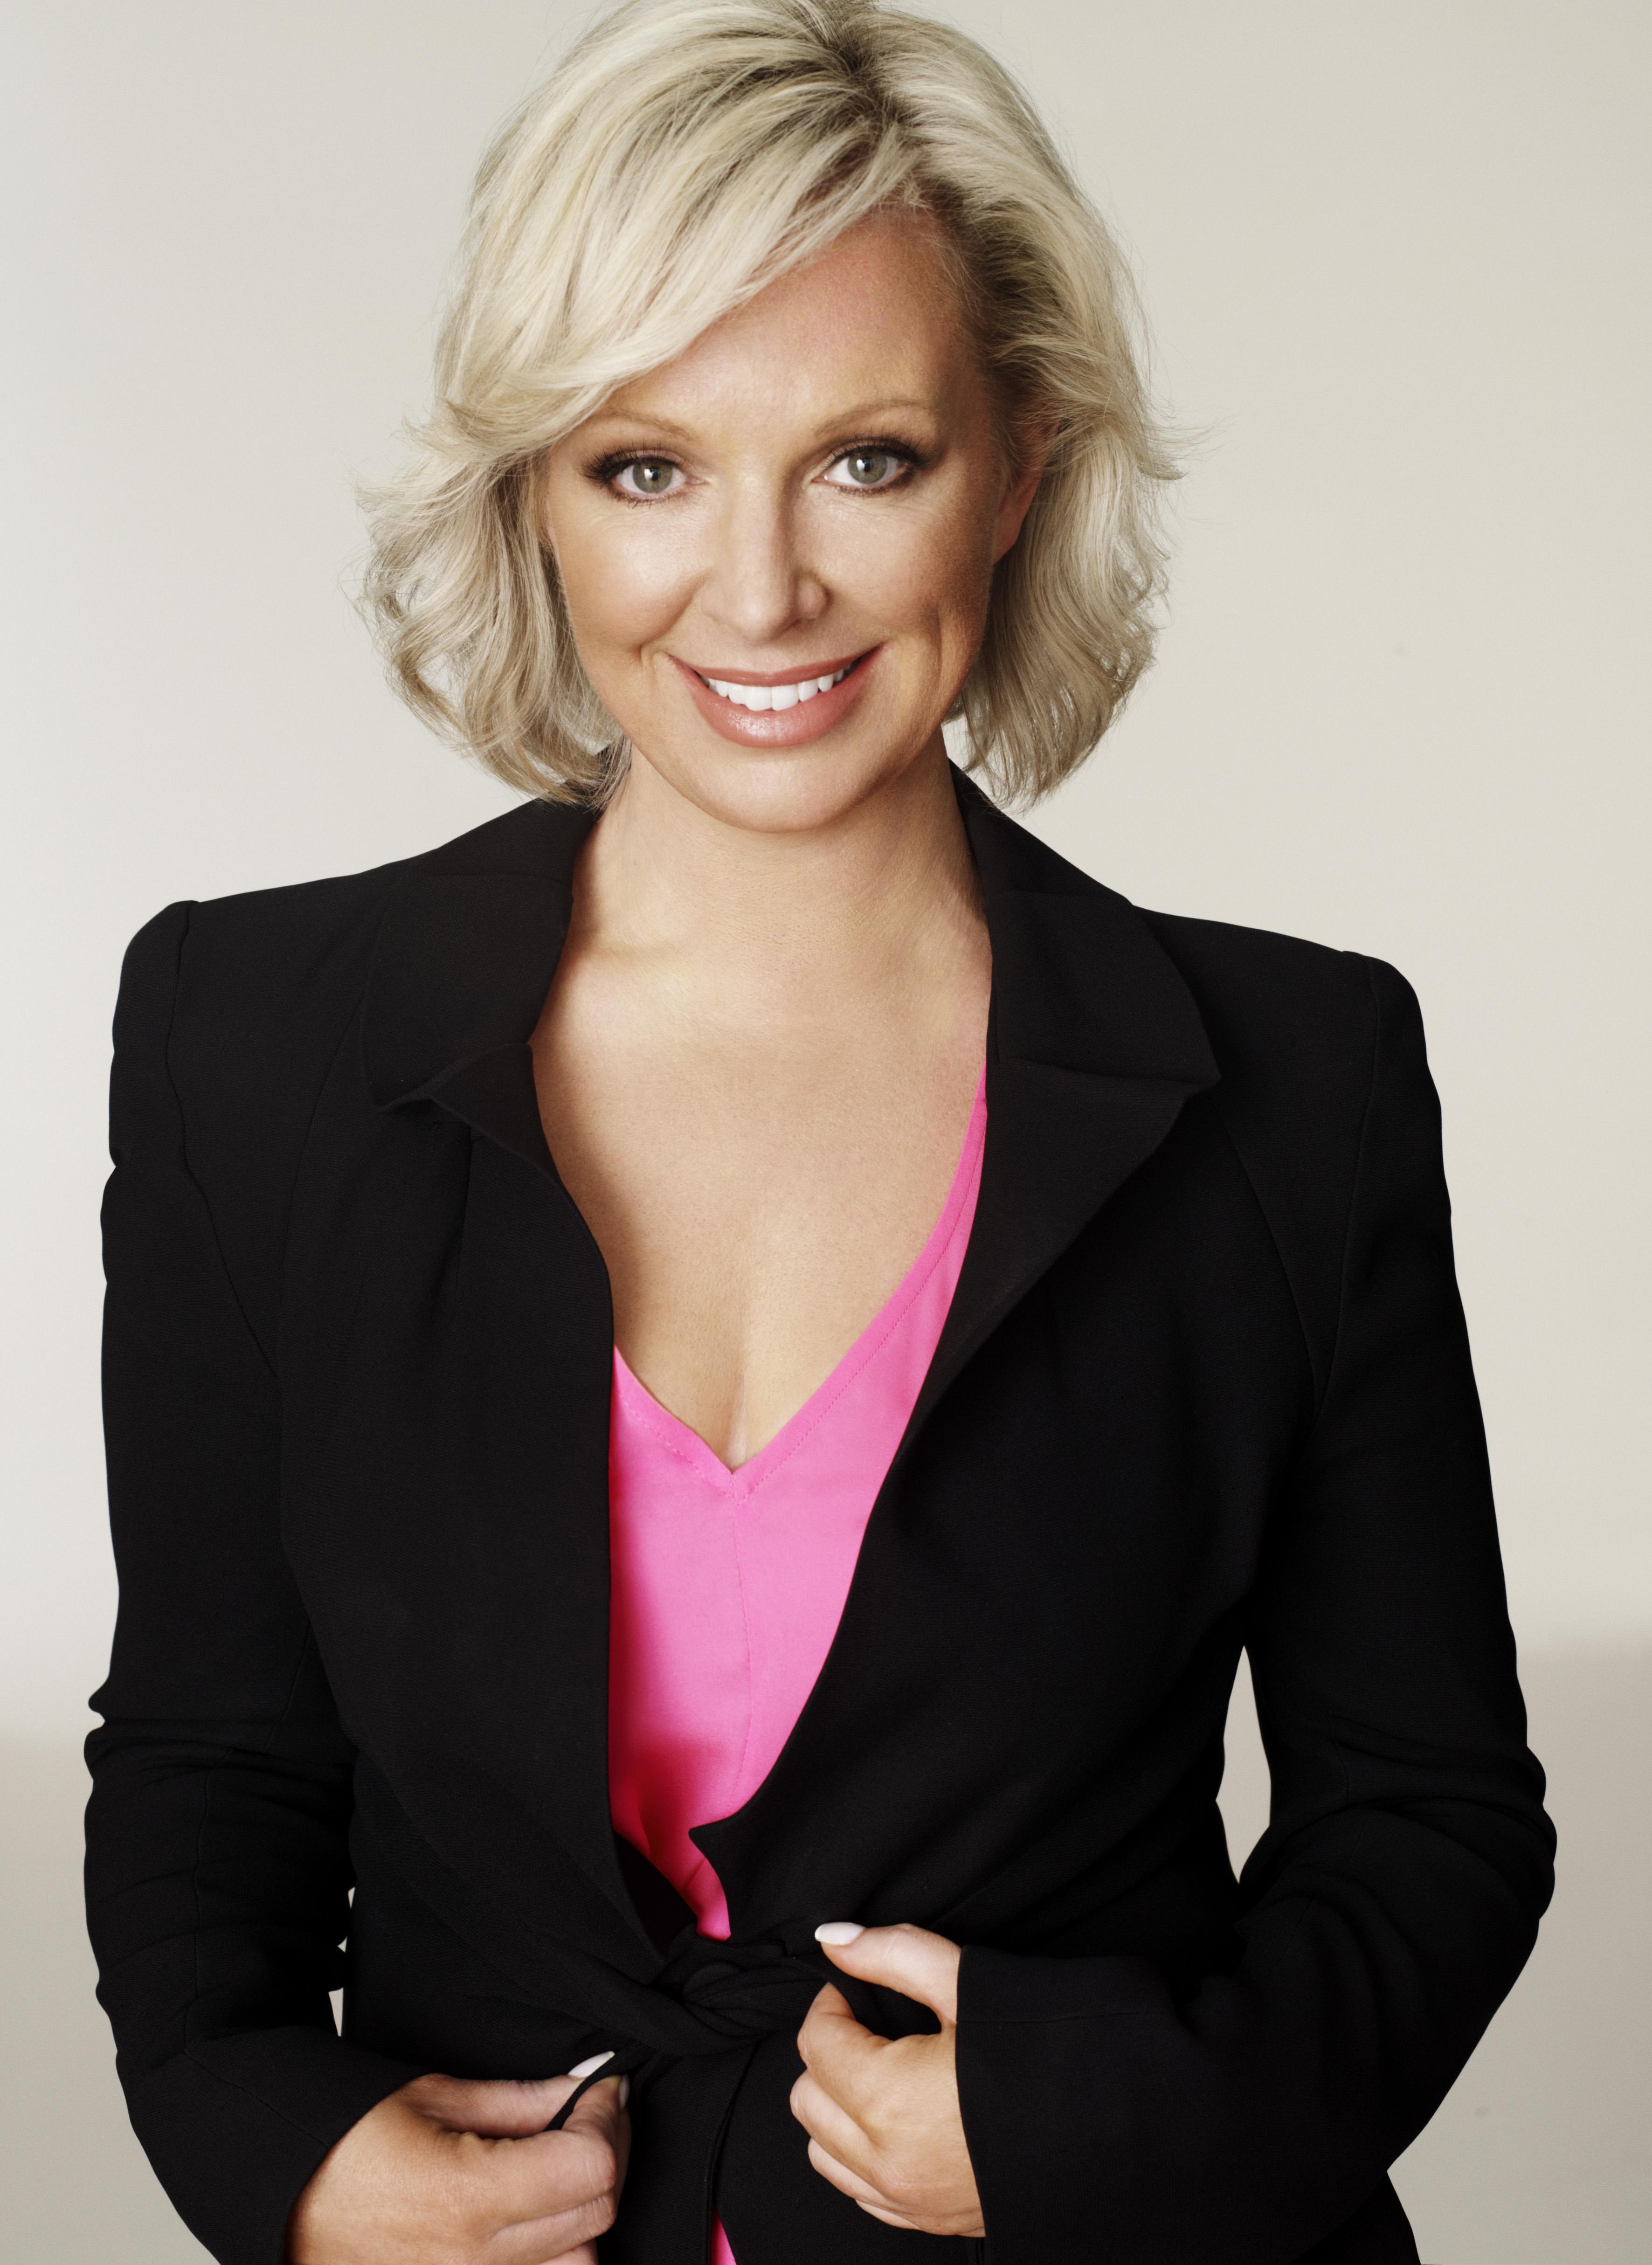 Shelley Barrett ModelCo CEO_6_HIRES(3MB)